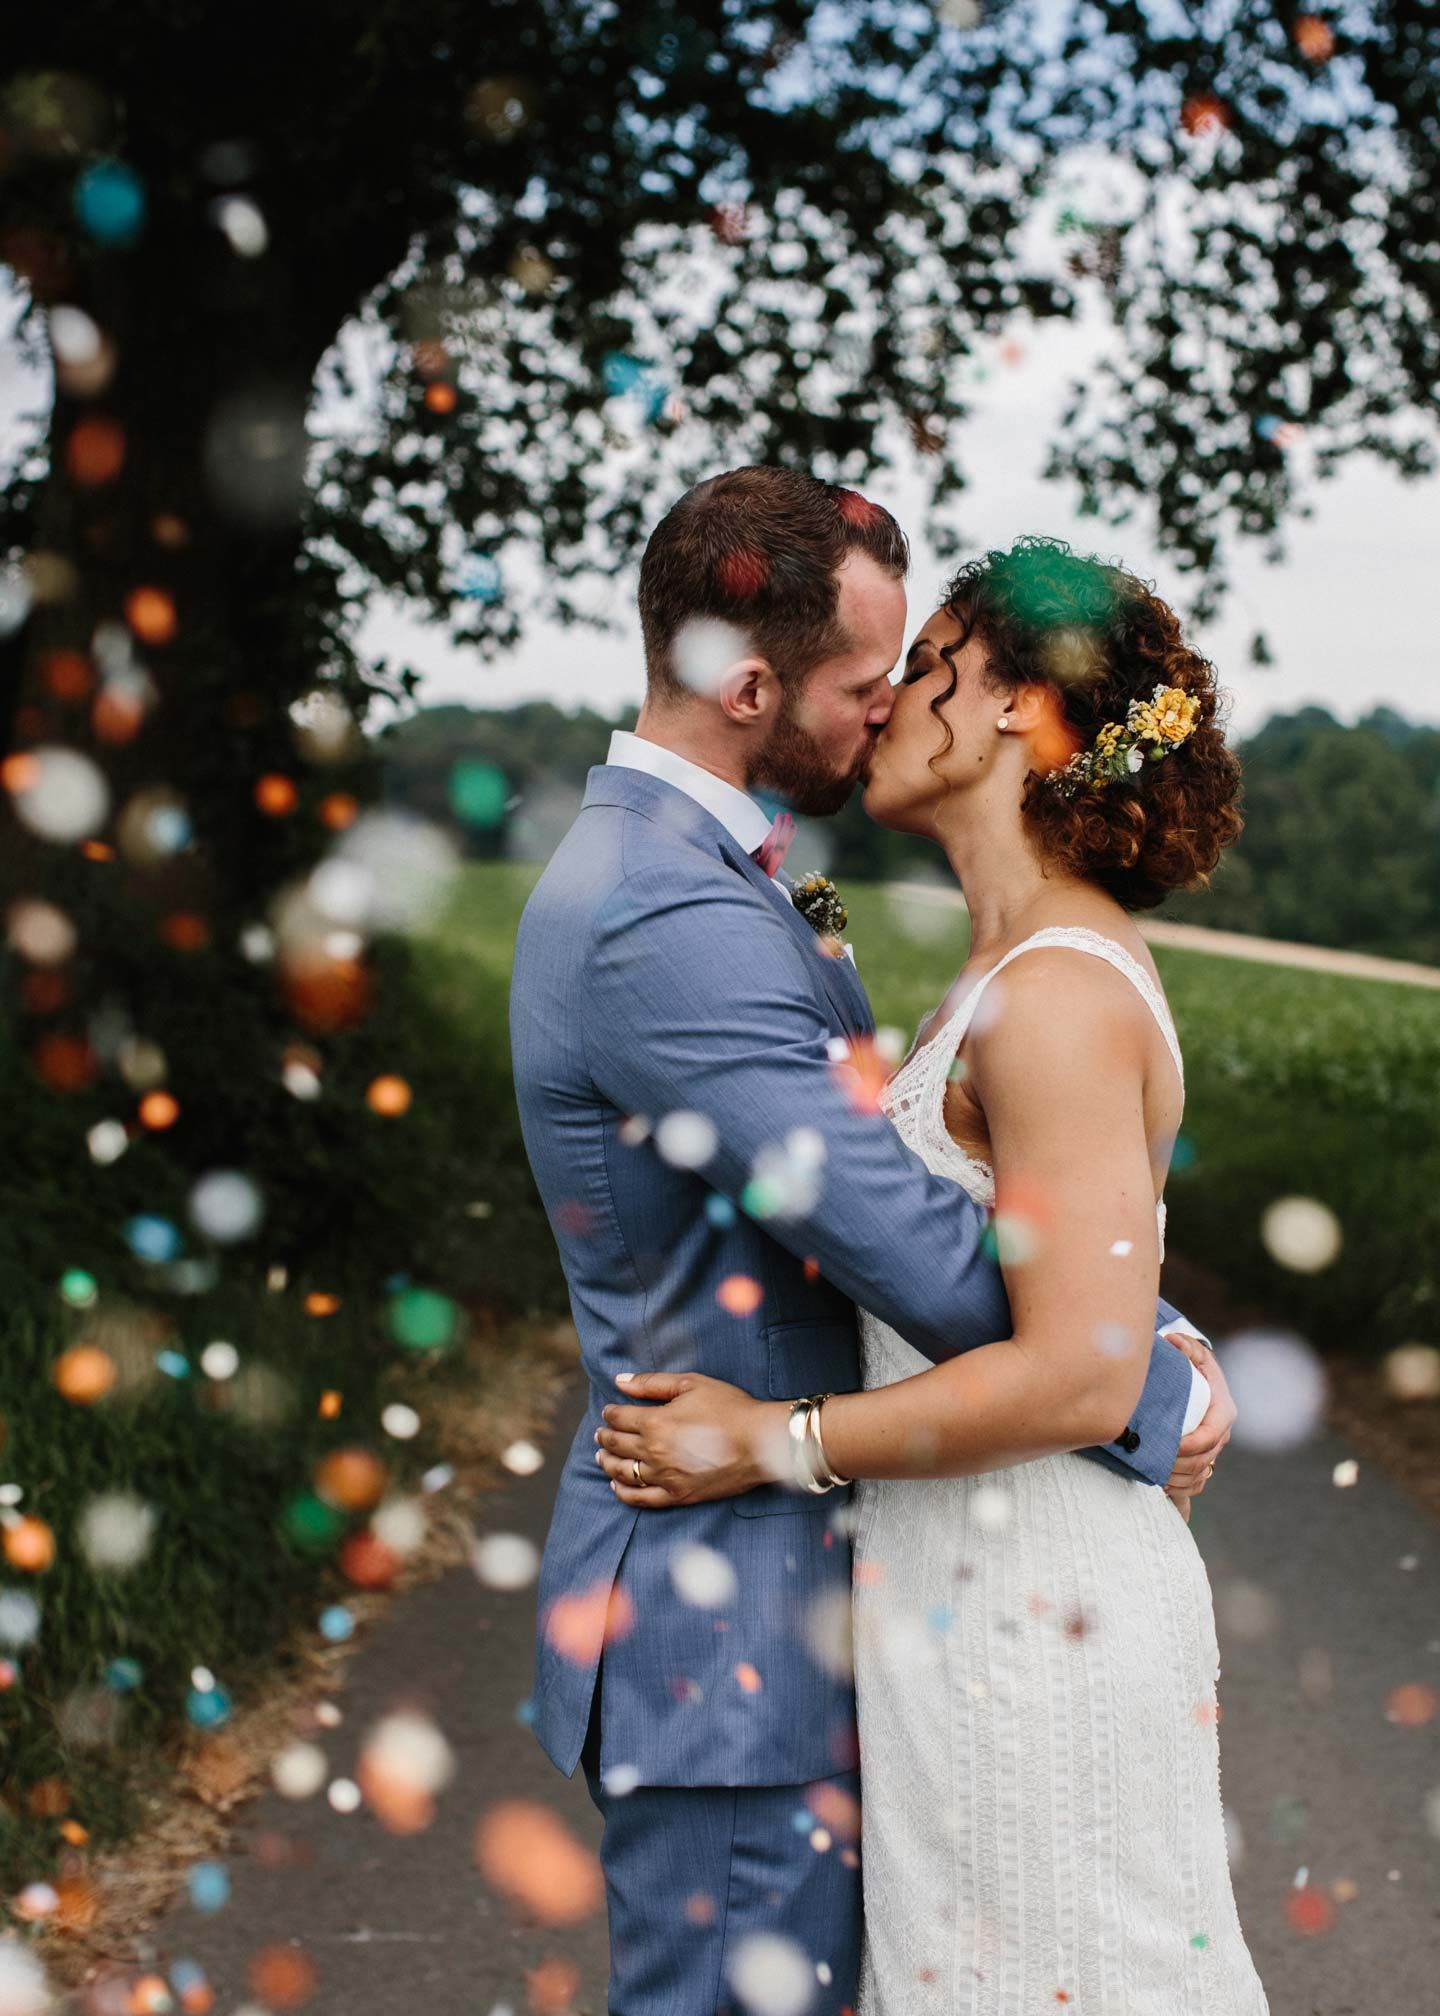 Joana & Mathes: Skandinavisch inspirierte Sommerhochzeit - Hochzeitswahn - Sei inspiriert